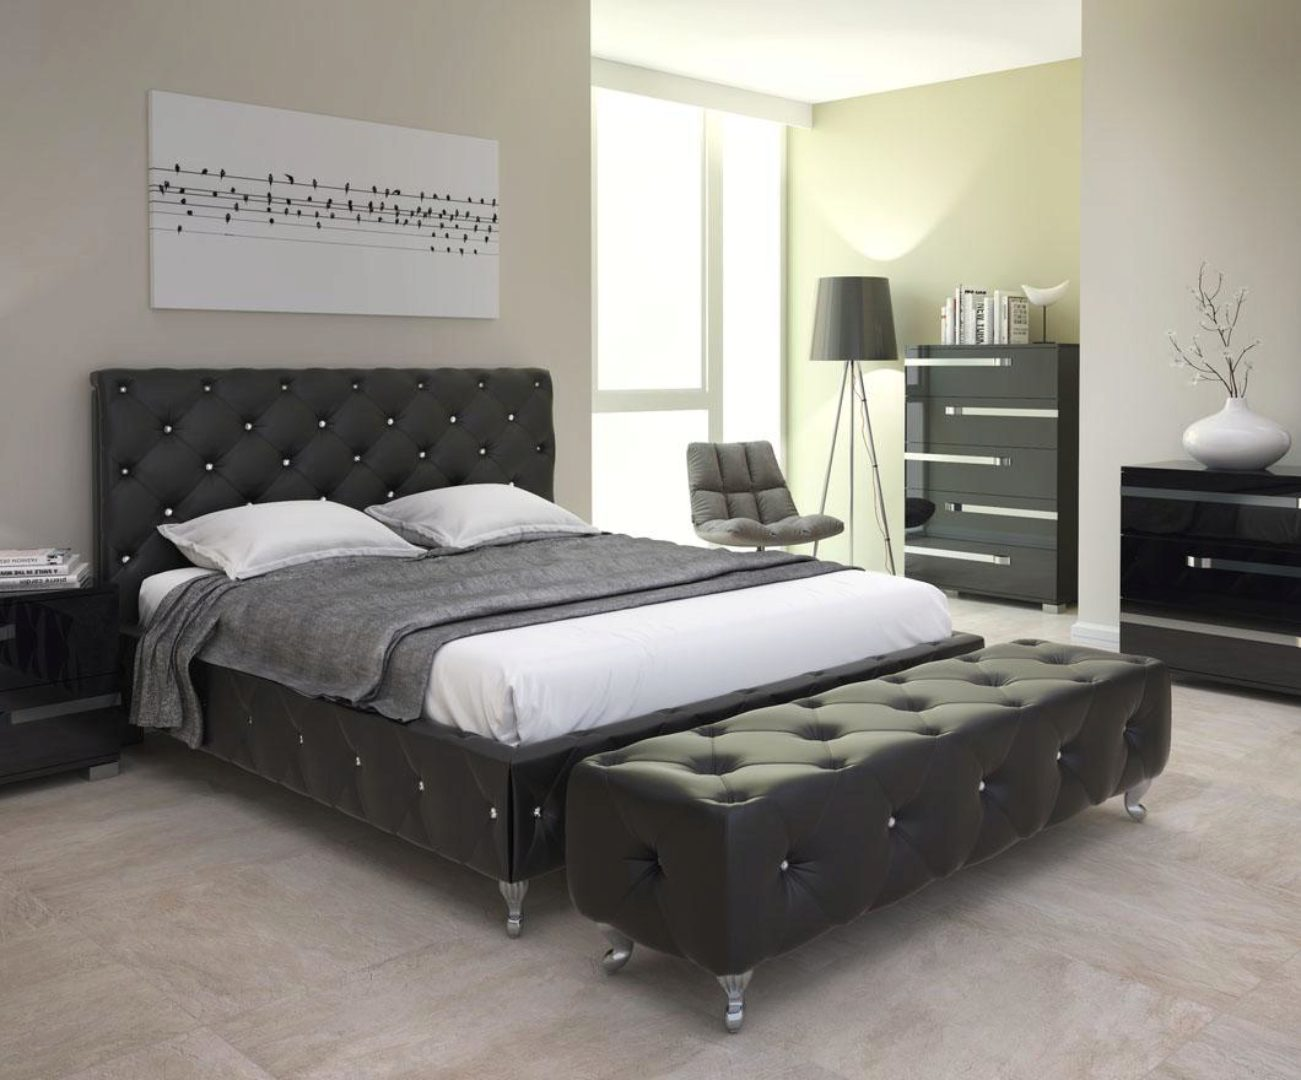 At Home USA Volare Glossy Black King Bedroom Set 3Pcs ...